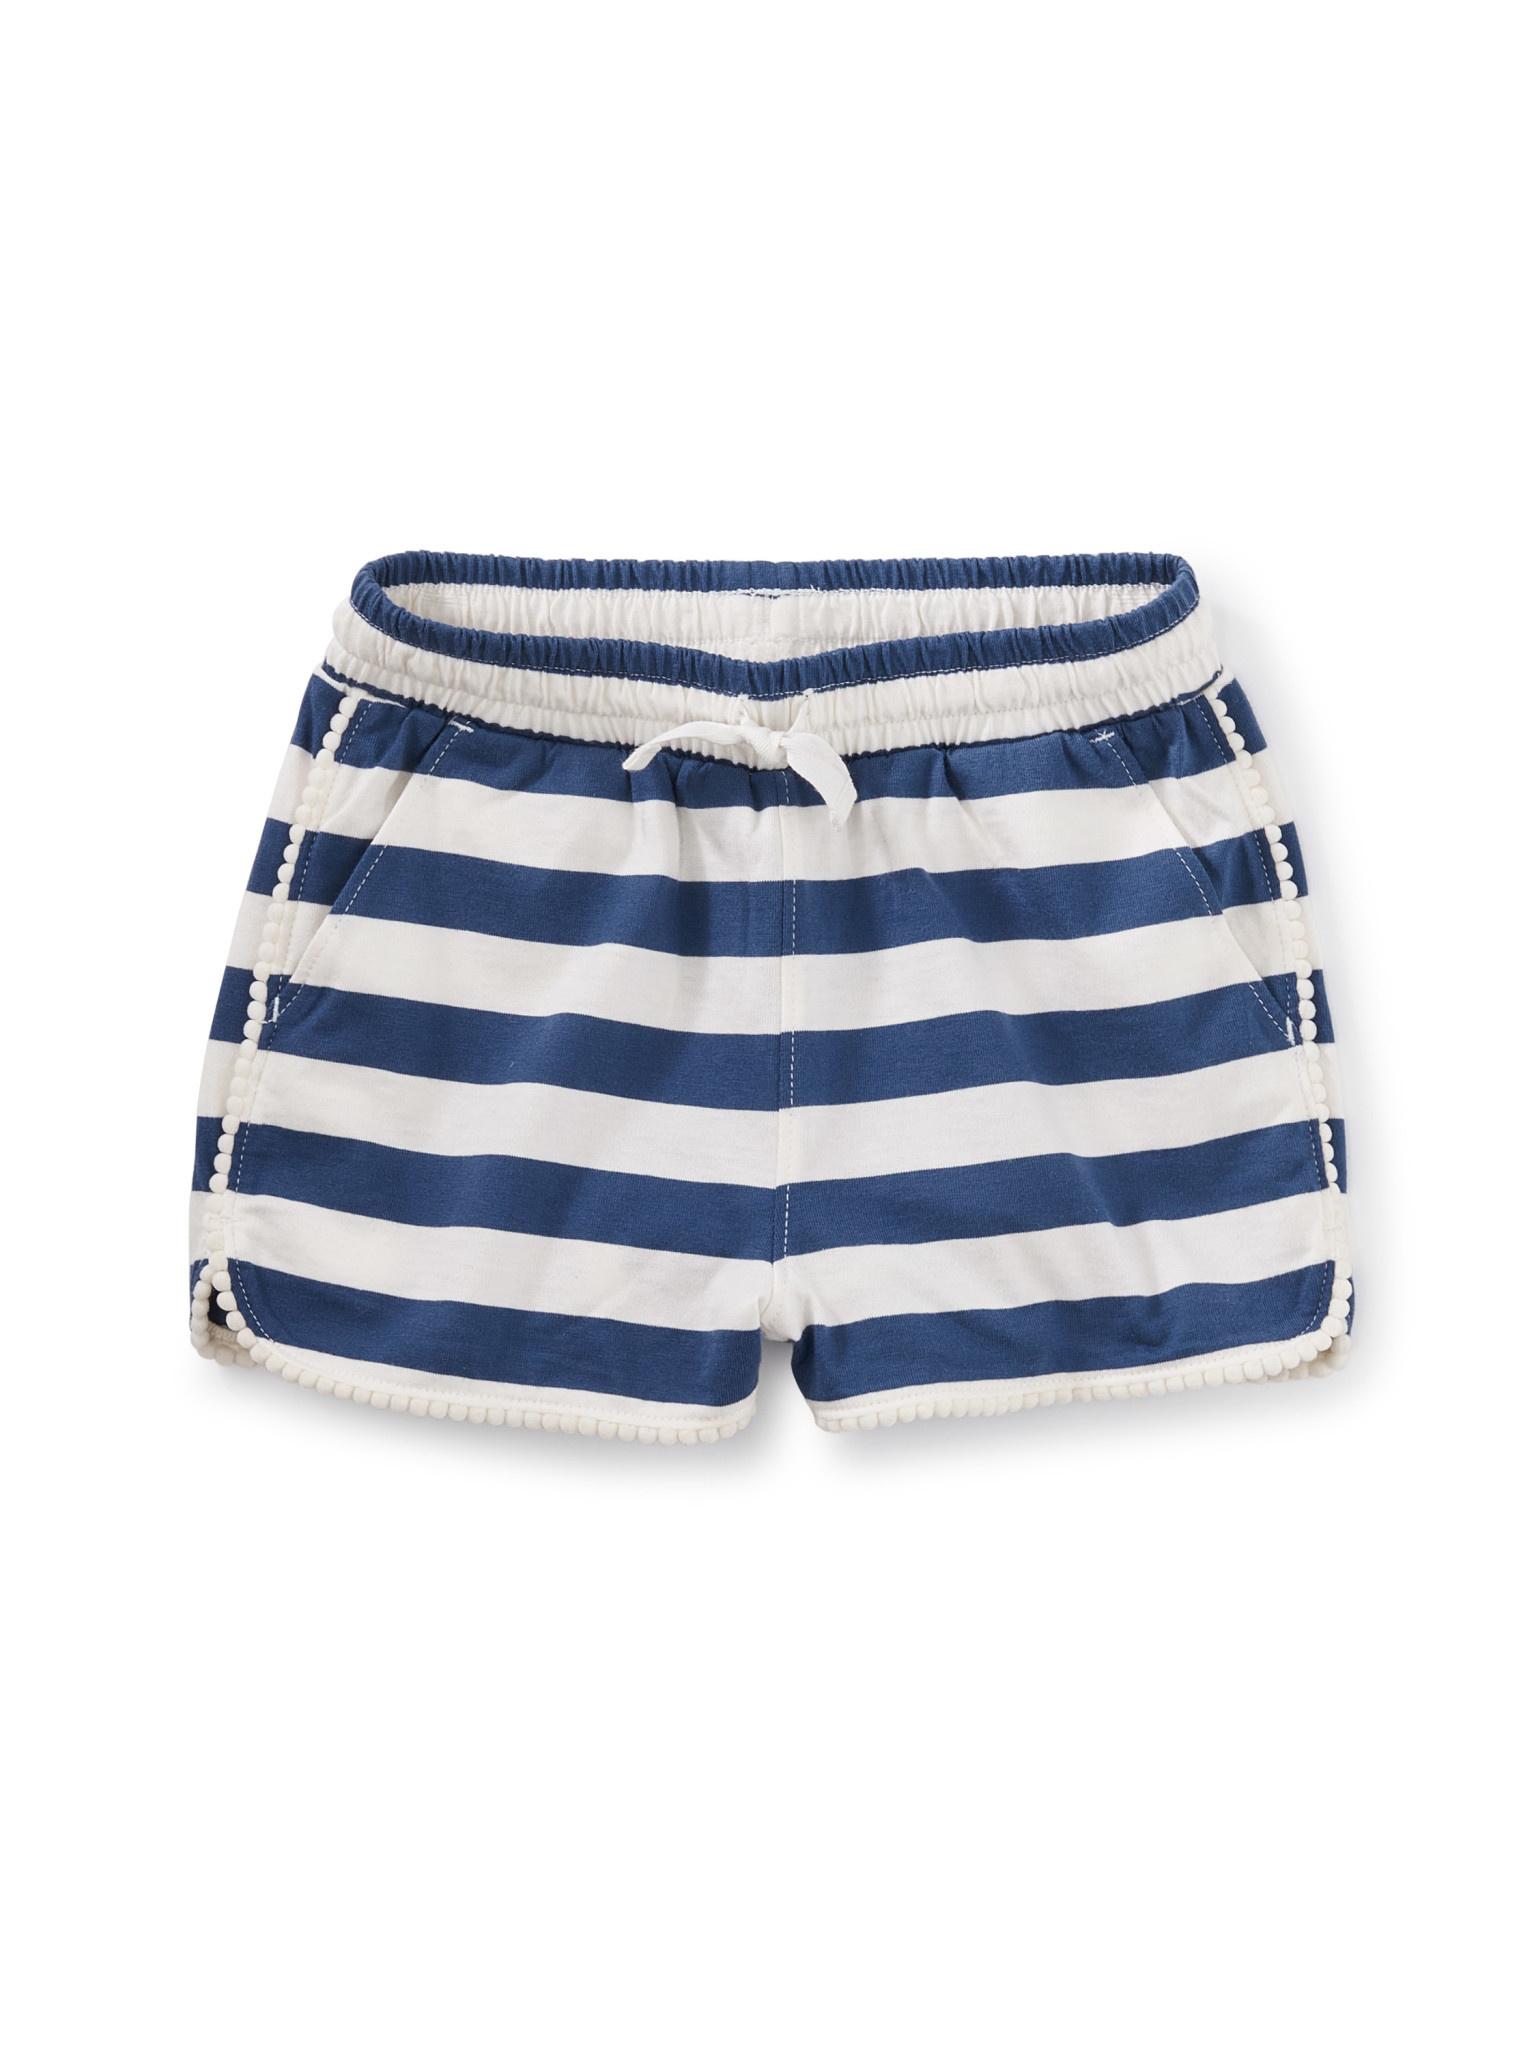 Tea Collection Cobalt Striped Pom Shorts